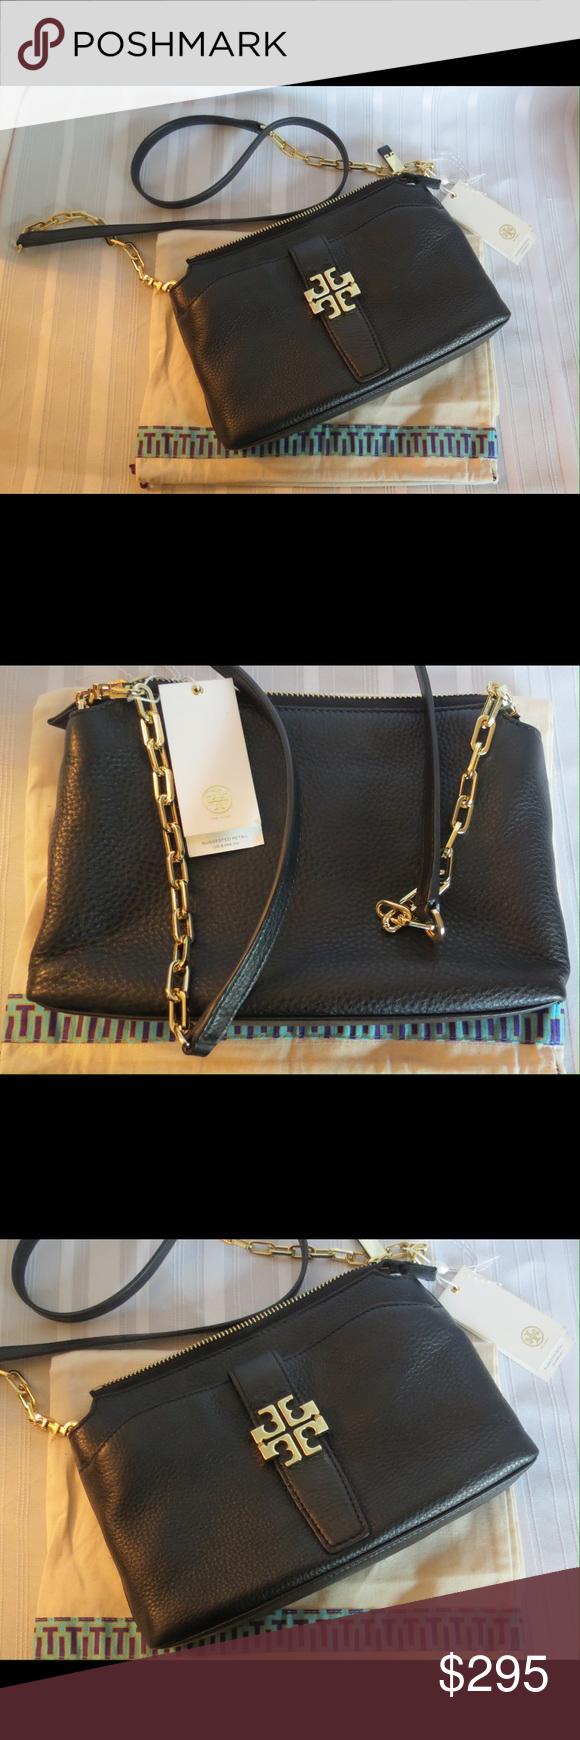 35254c5300c NWT Tory Burch MEYER CHAIN Leather Crossbody Bag